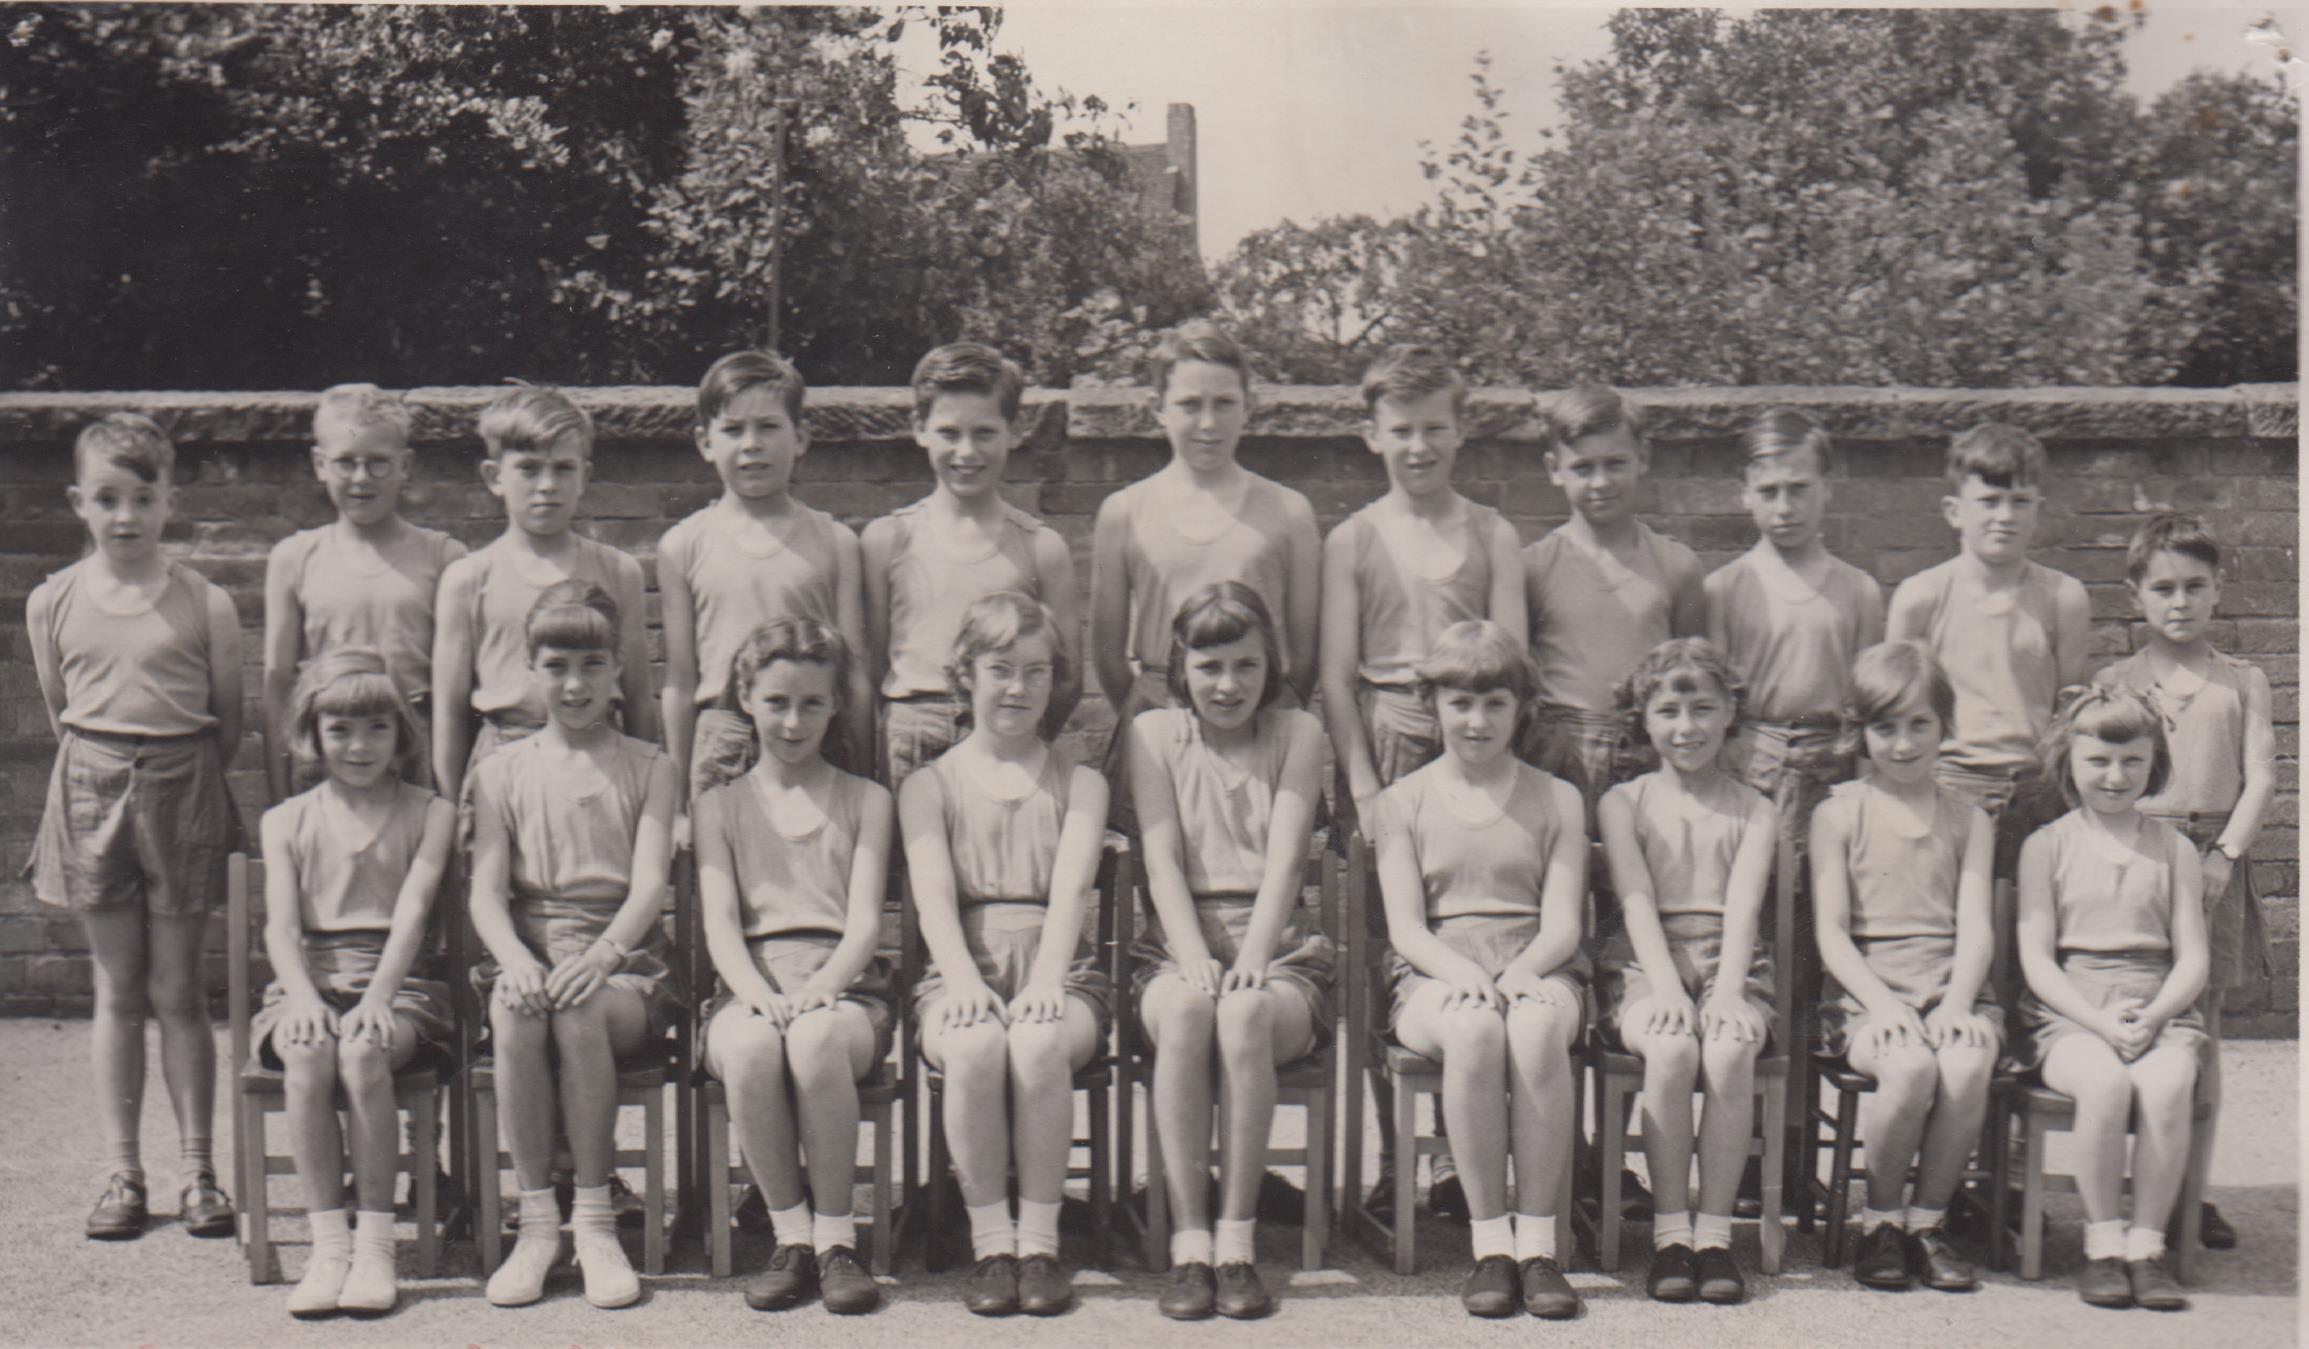 school_sports_team_1959_001.jpg